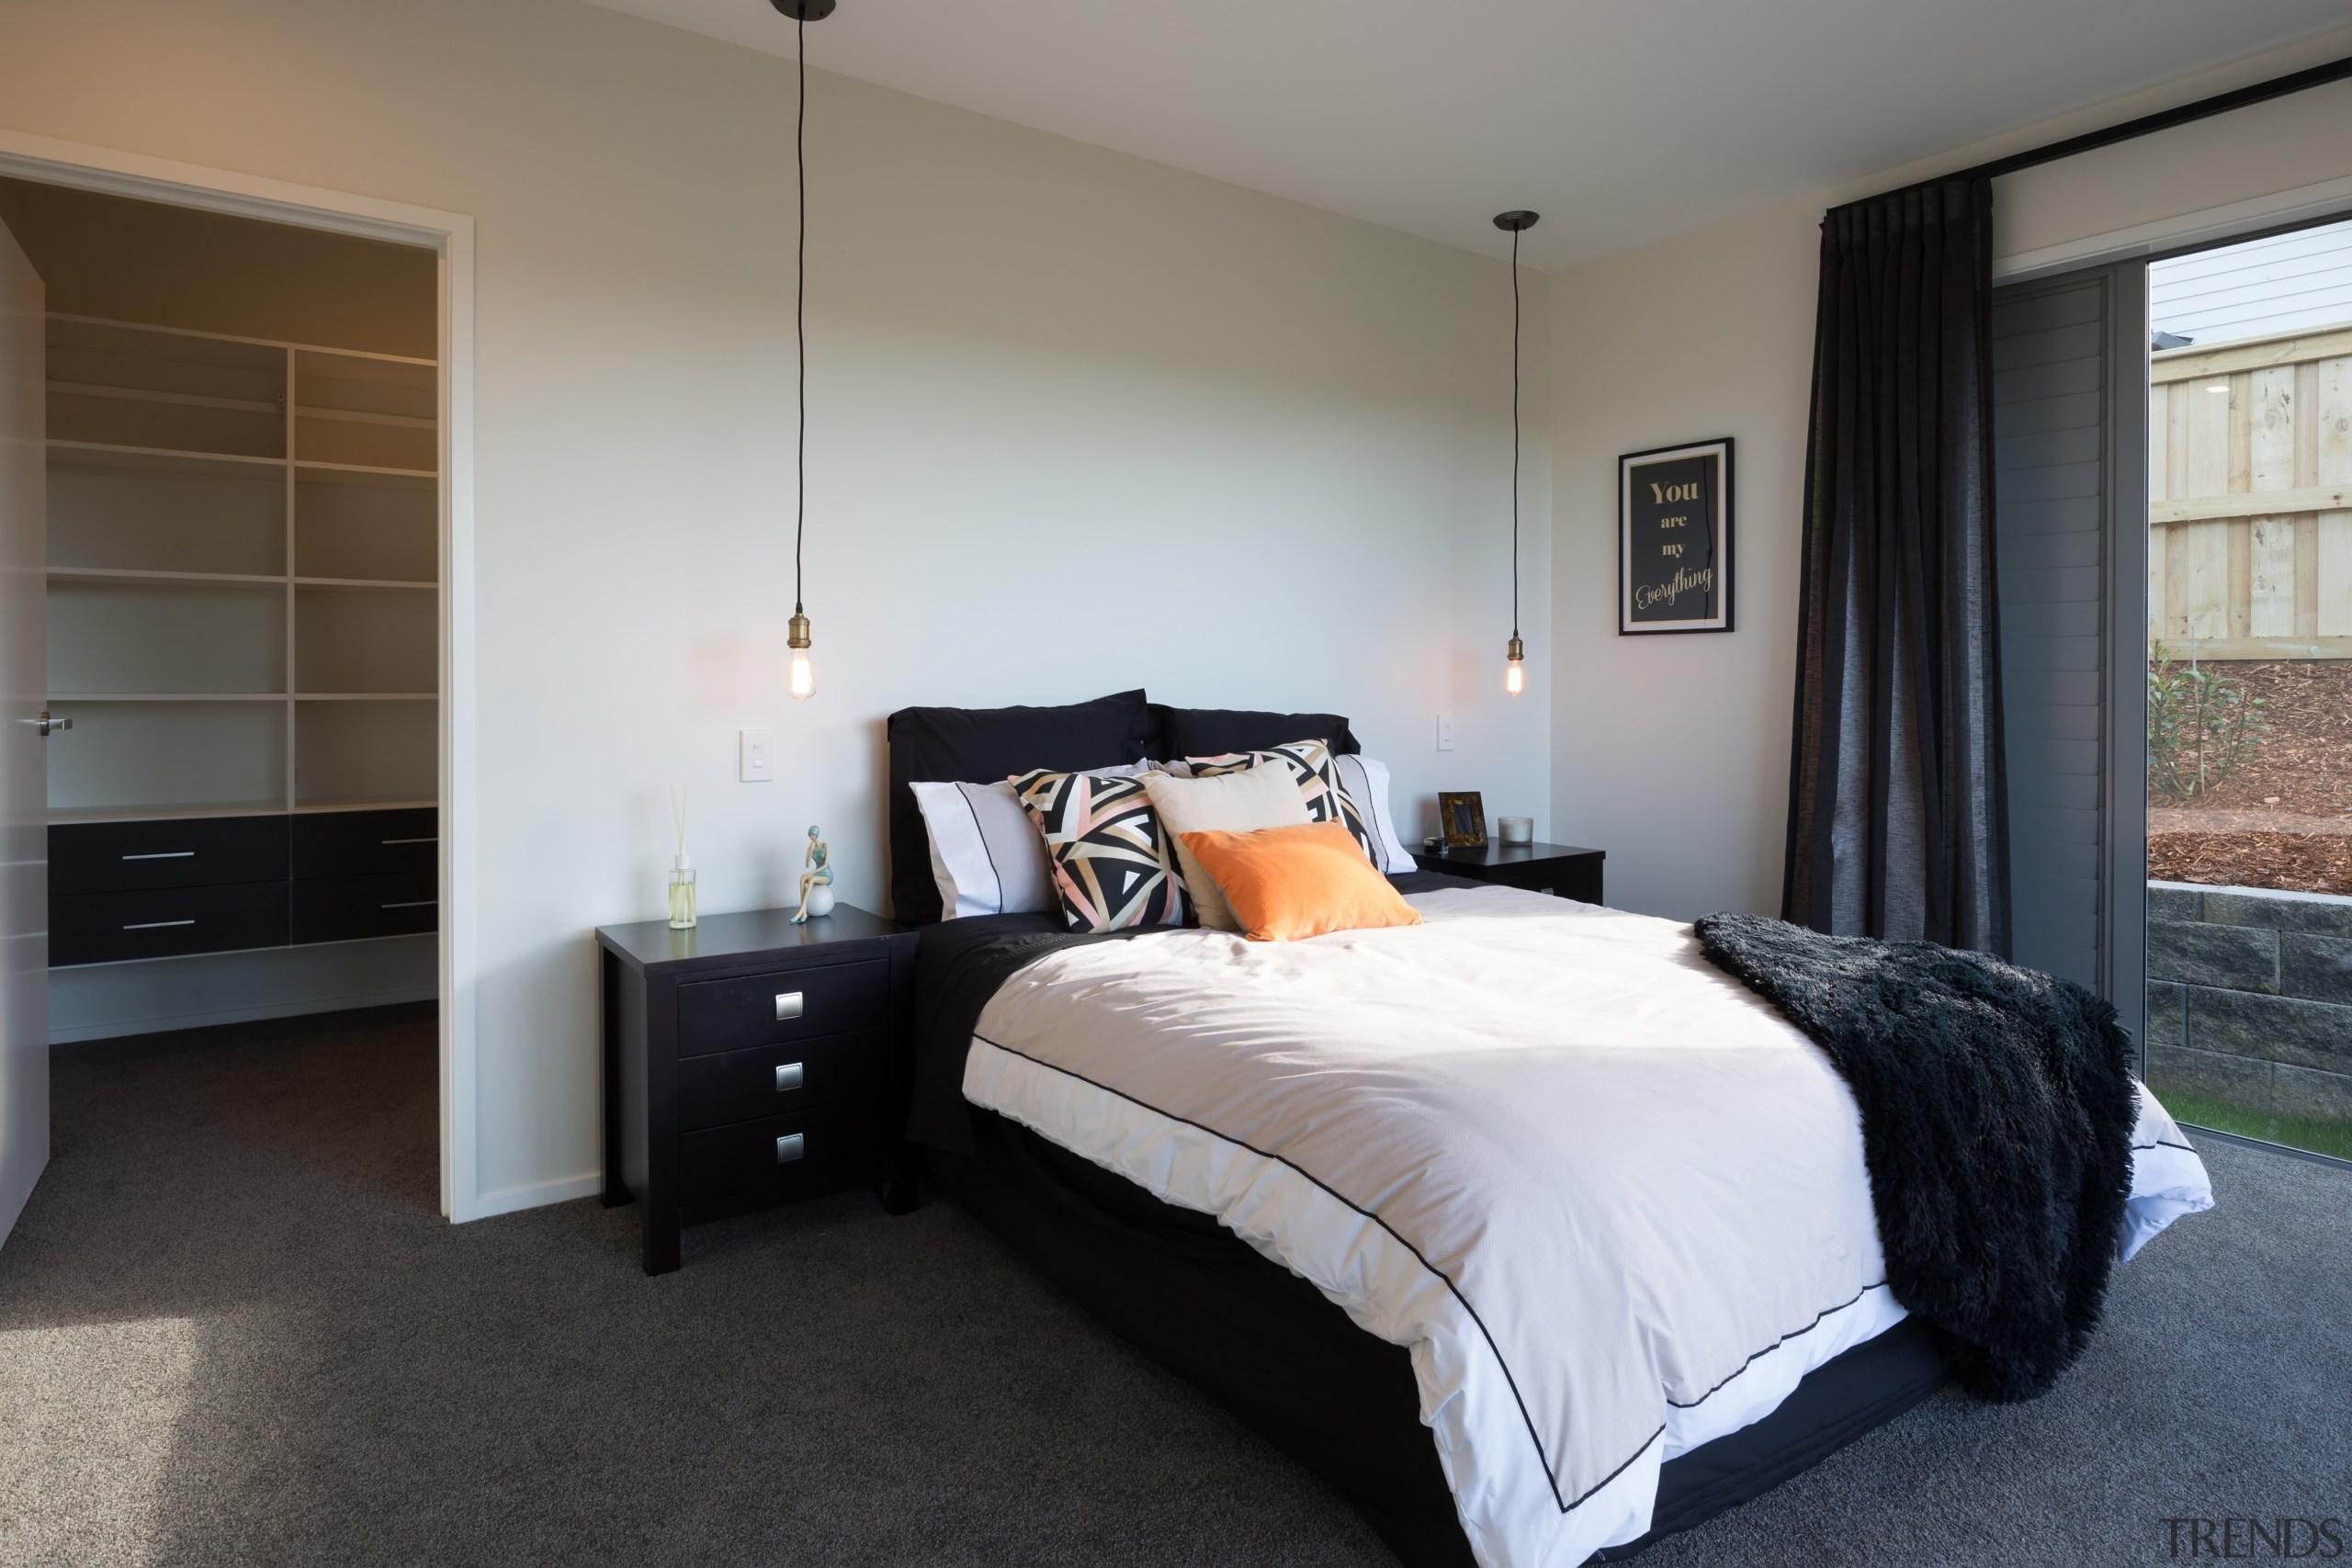 Landmark Homes Riverhead Design Master Bedroom - Landmark bed frame, bedroom, floor, furniture, home, interior design, property, real estate, room, wall, window, gray, black